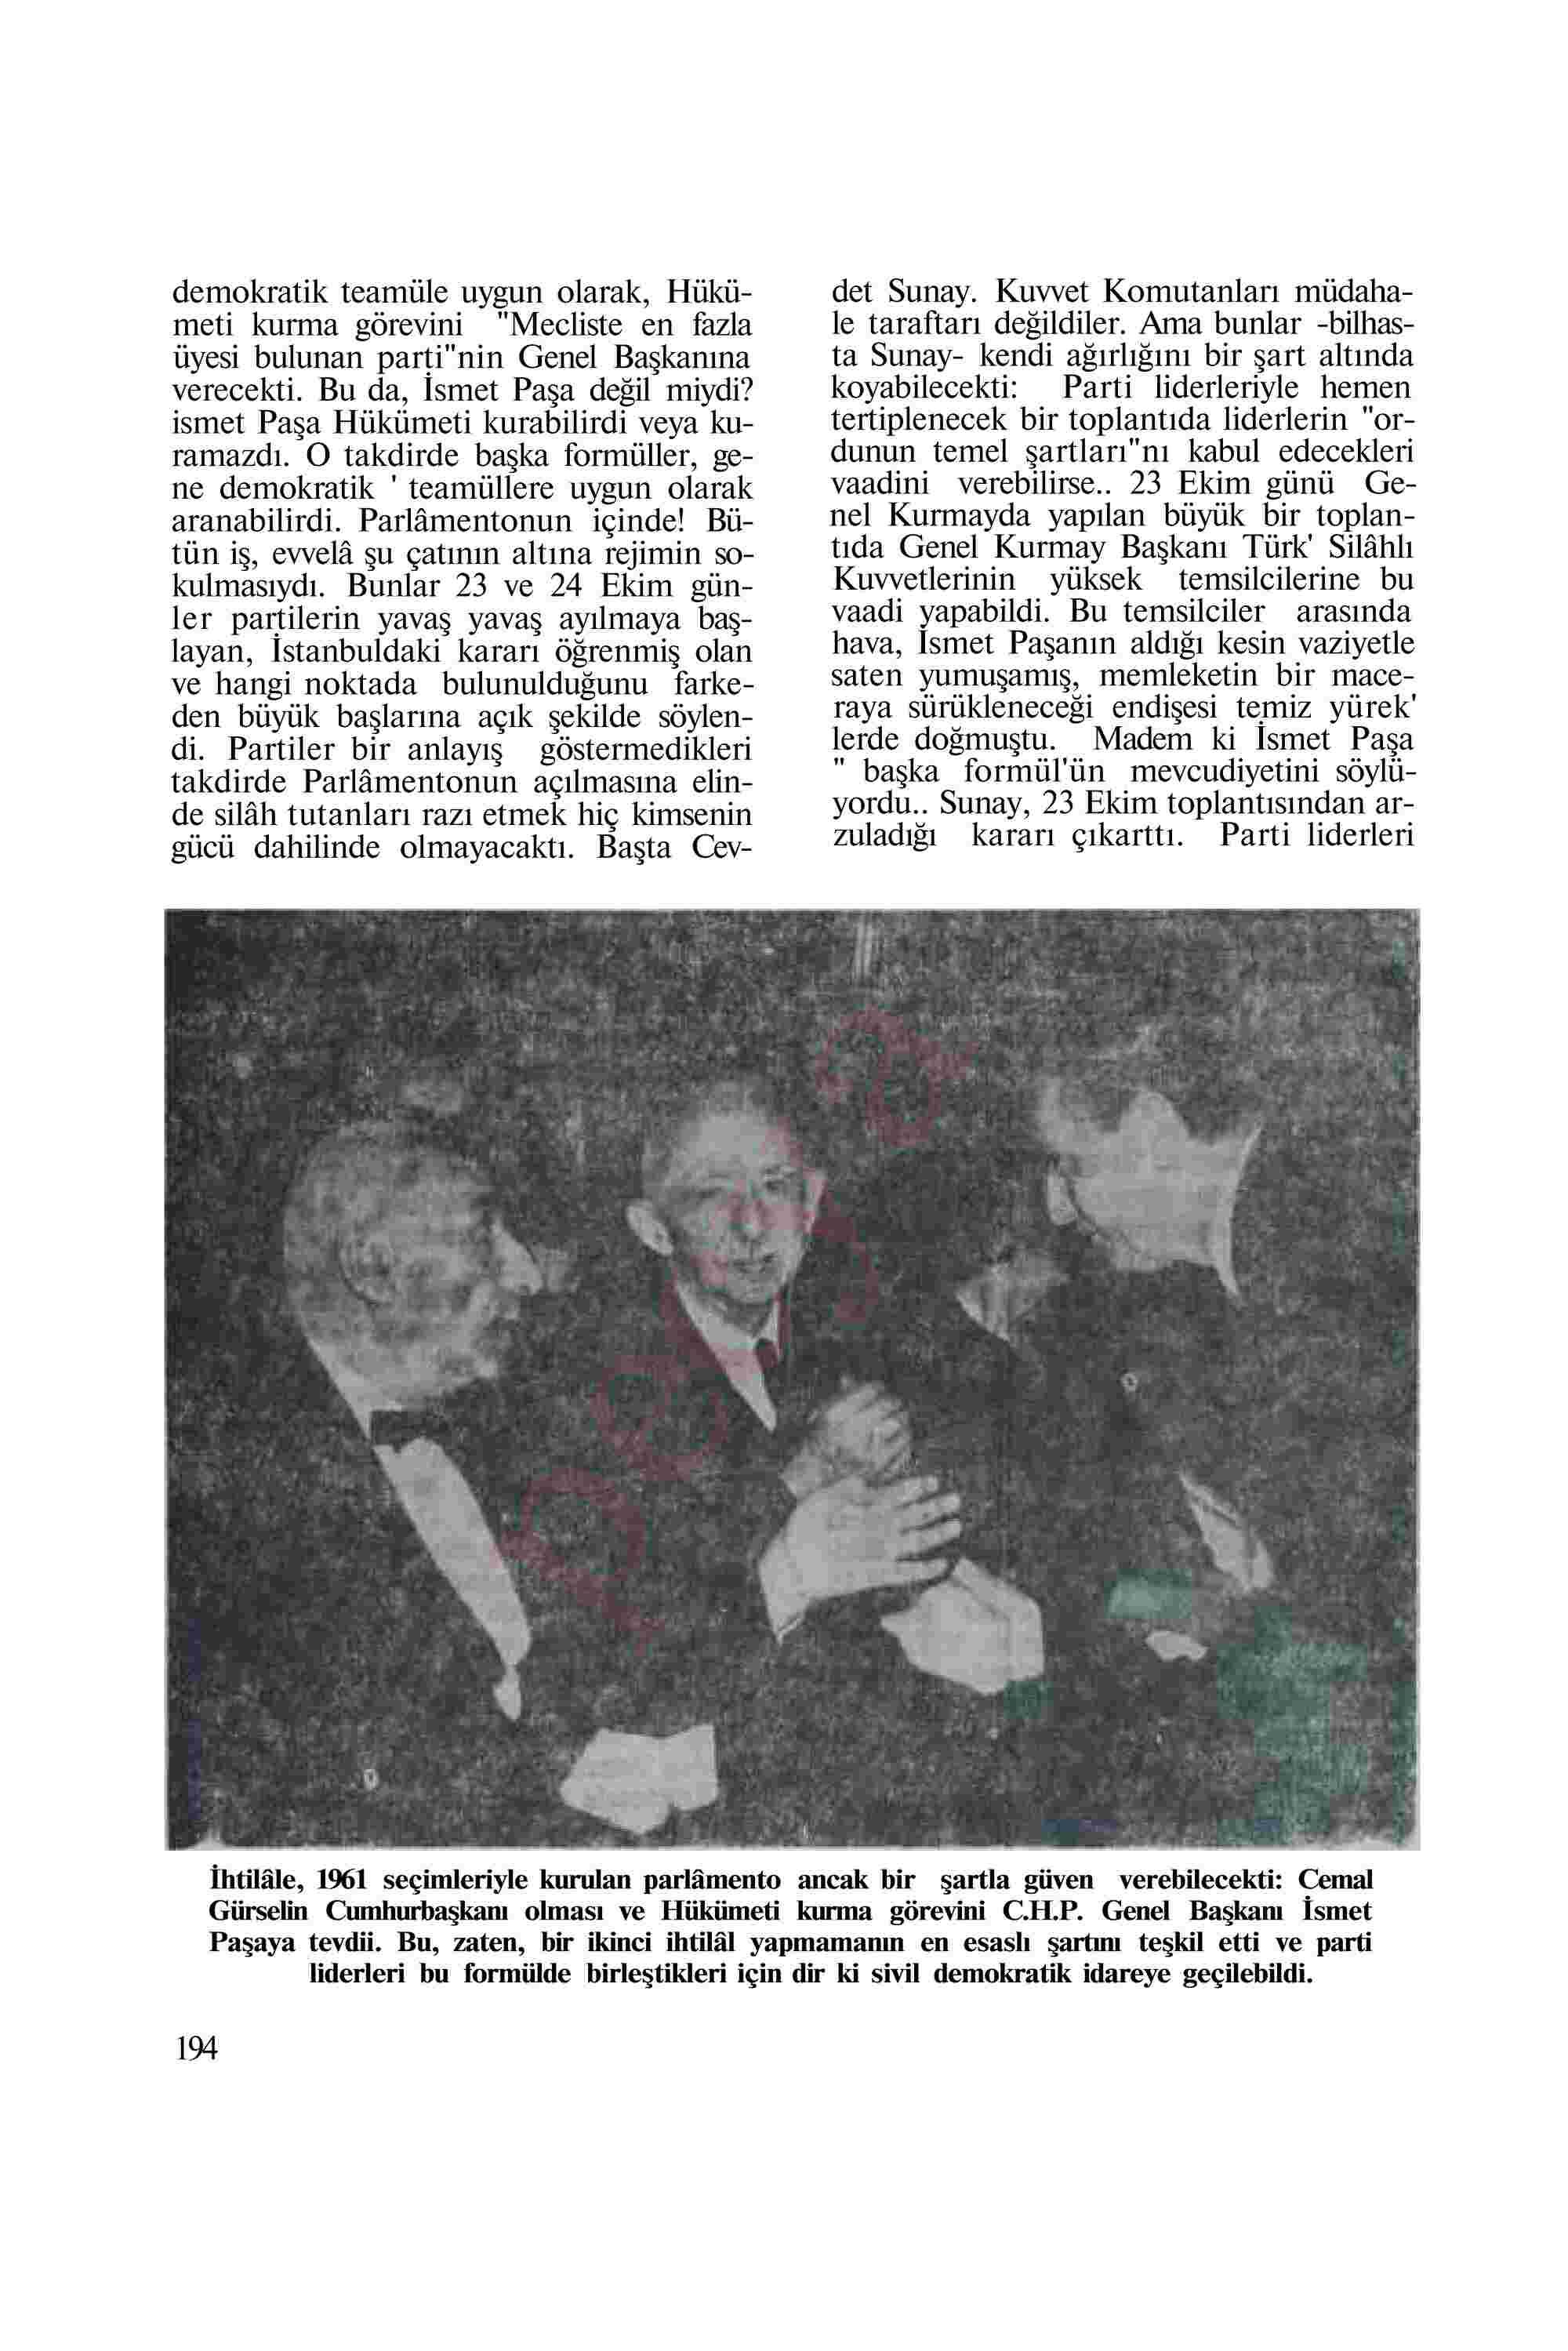 1 Nisan 1967 Tarihli Akis Dergisi Sayfa 20